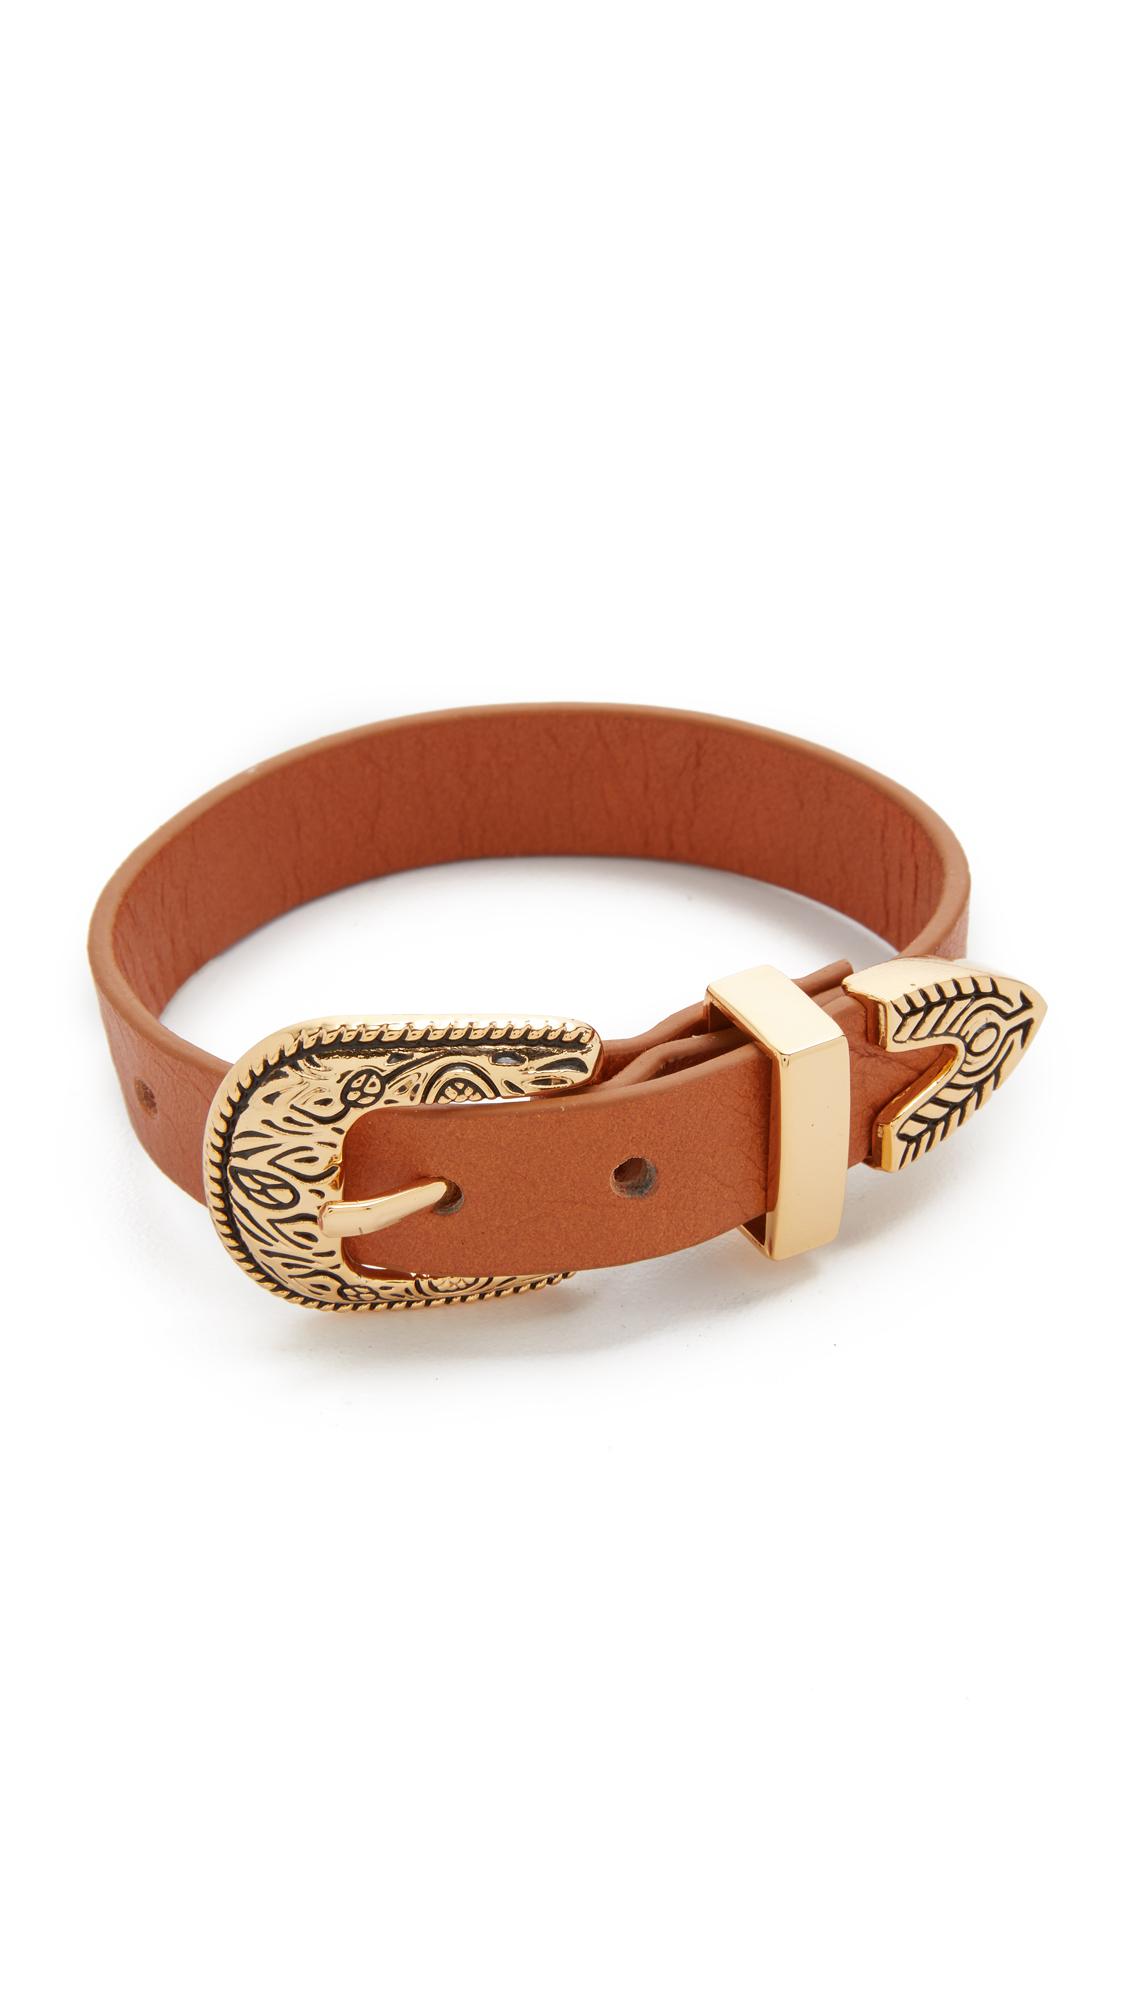 B-Low The Belt Bri Bri Single Wrap Bracelet - Gold/Cognac at Shopbop